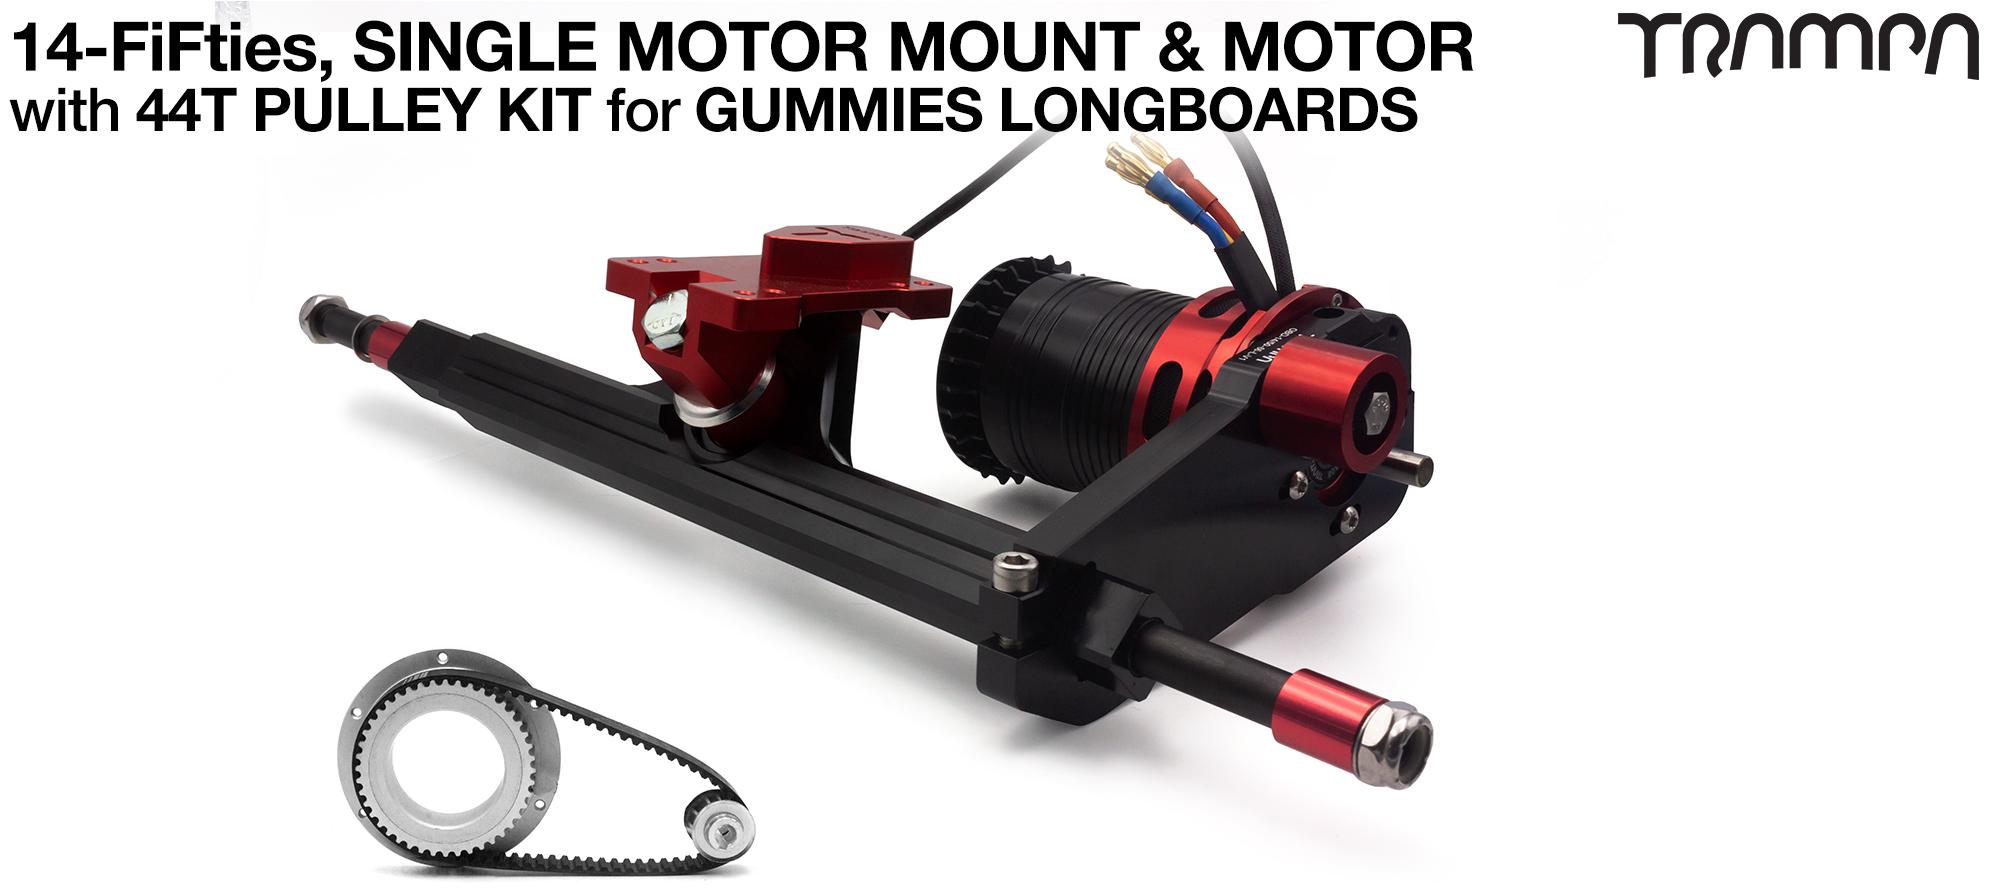 14FiFties Motor Mount with 62 Tooth URBAN  Pulley Kit & Motor & 2x 14FiFties Trucks - SINGLE